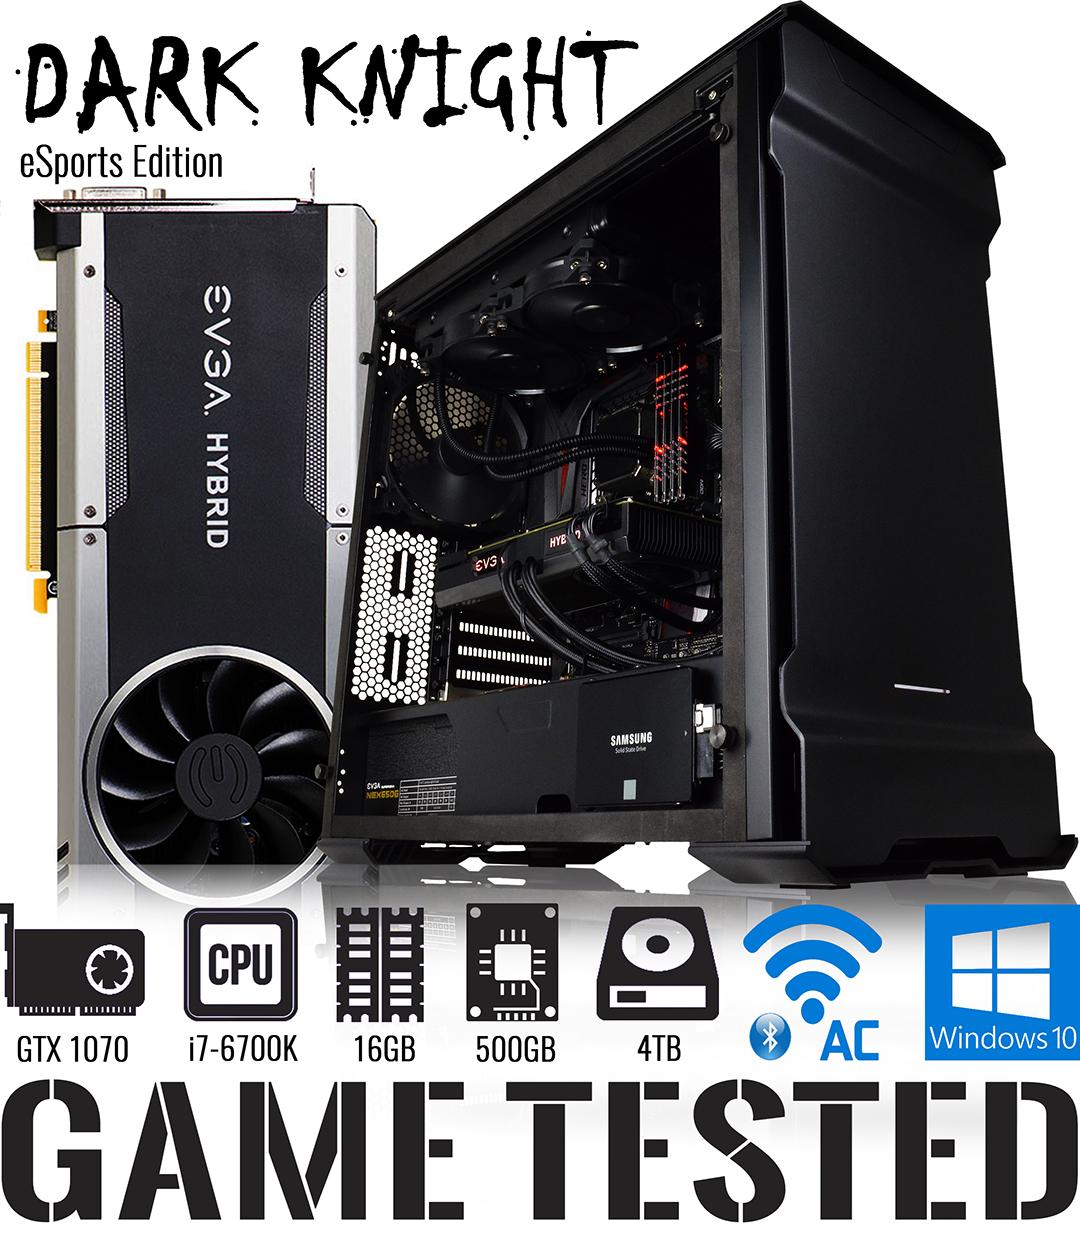 GGPC DARK KNIGHT GAMING PC